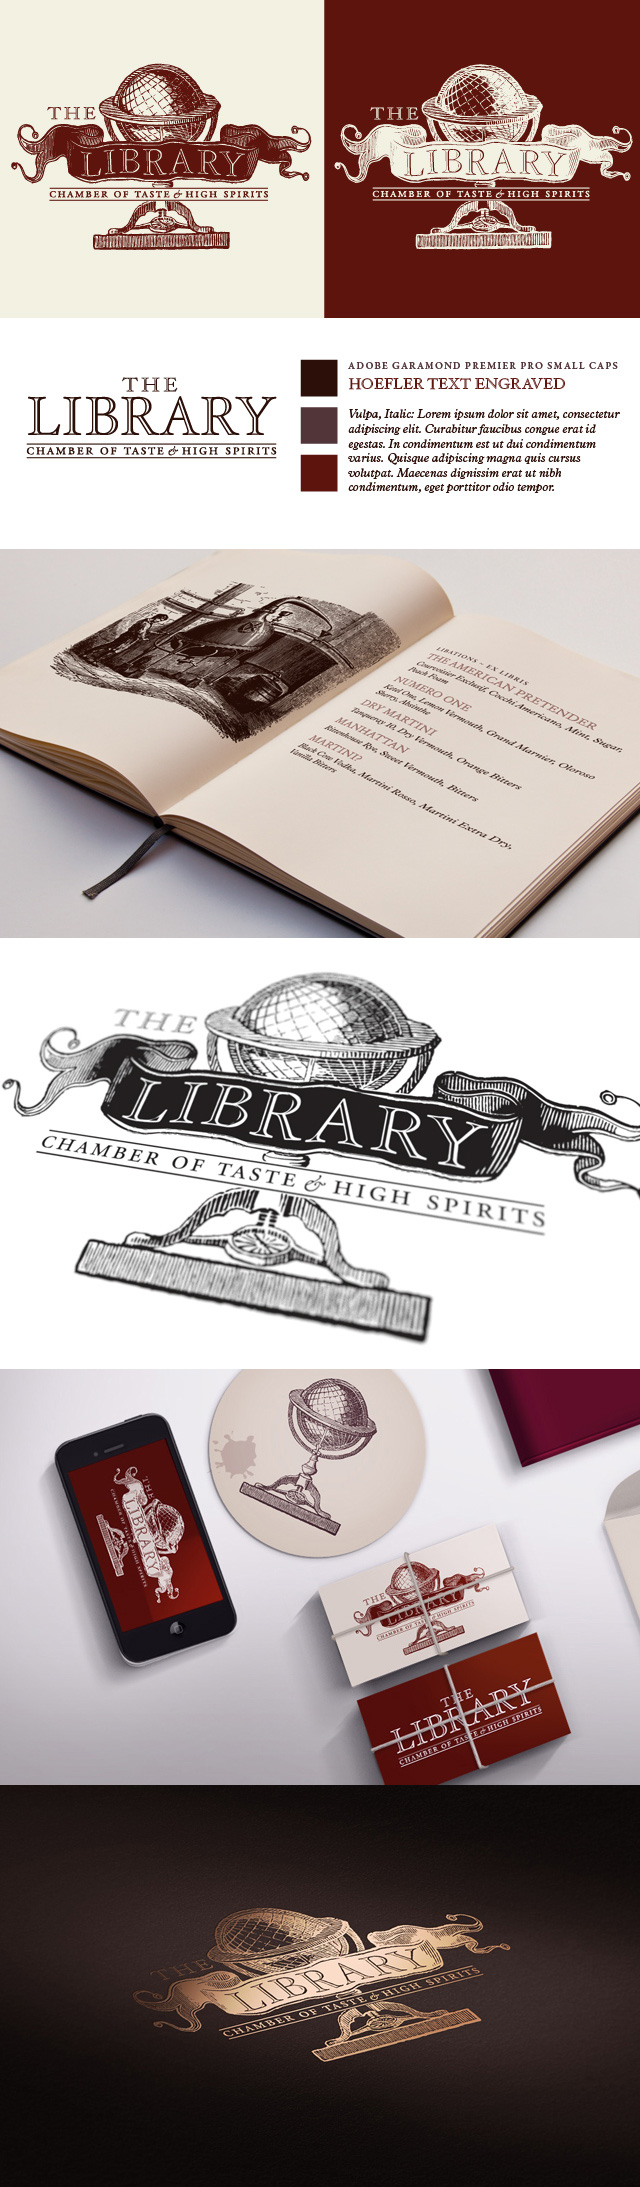 Logo Design: The Library